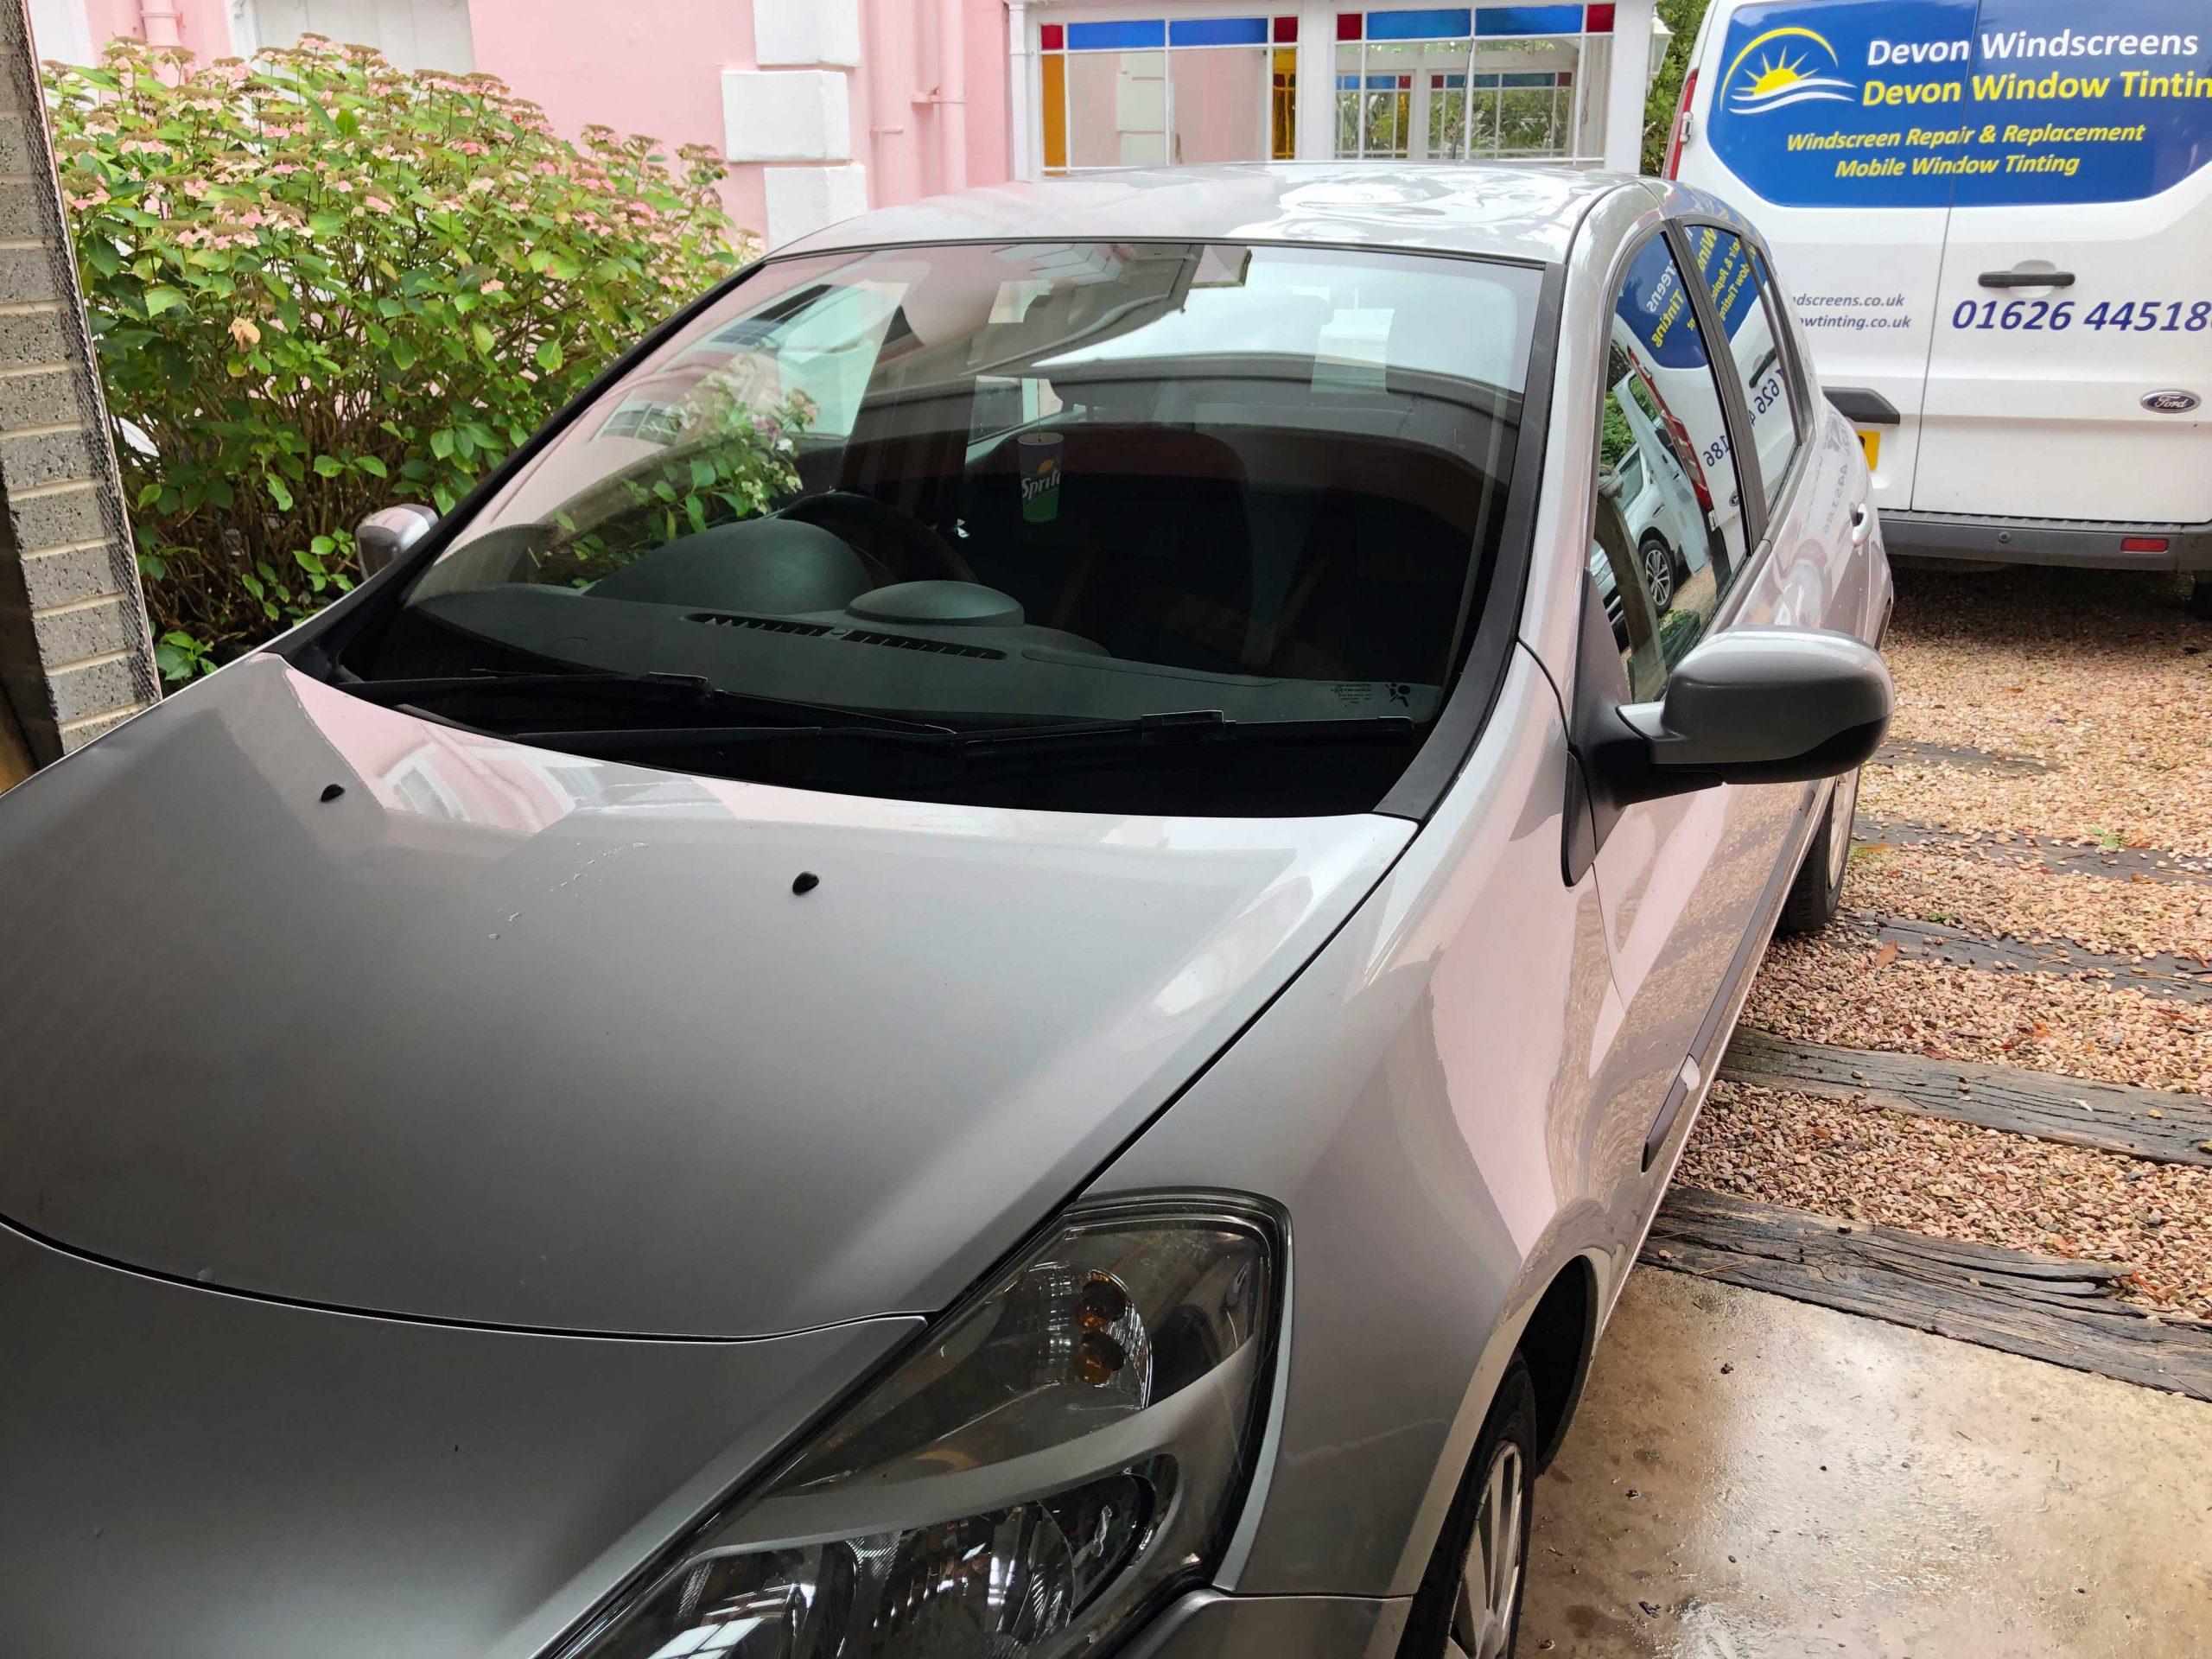 Renault Clio Mk3 Windscreen